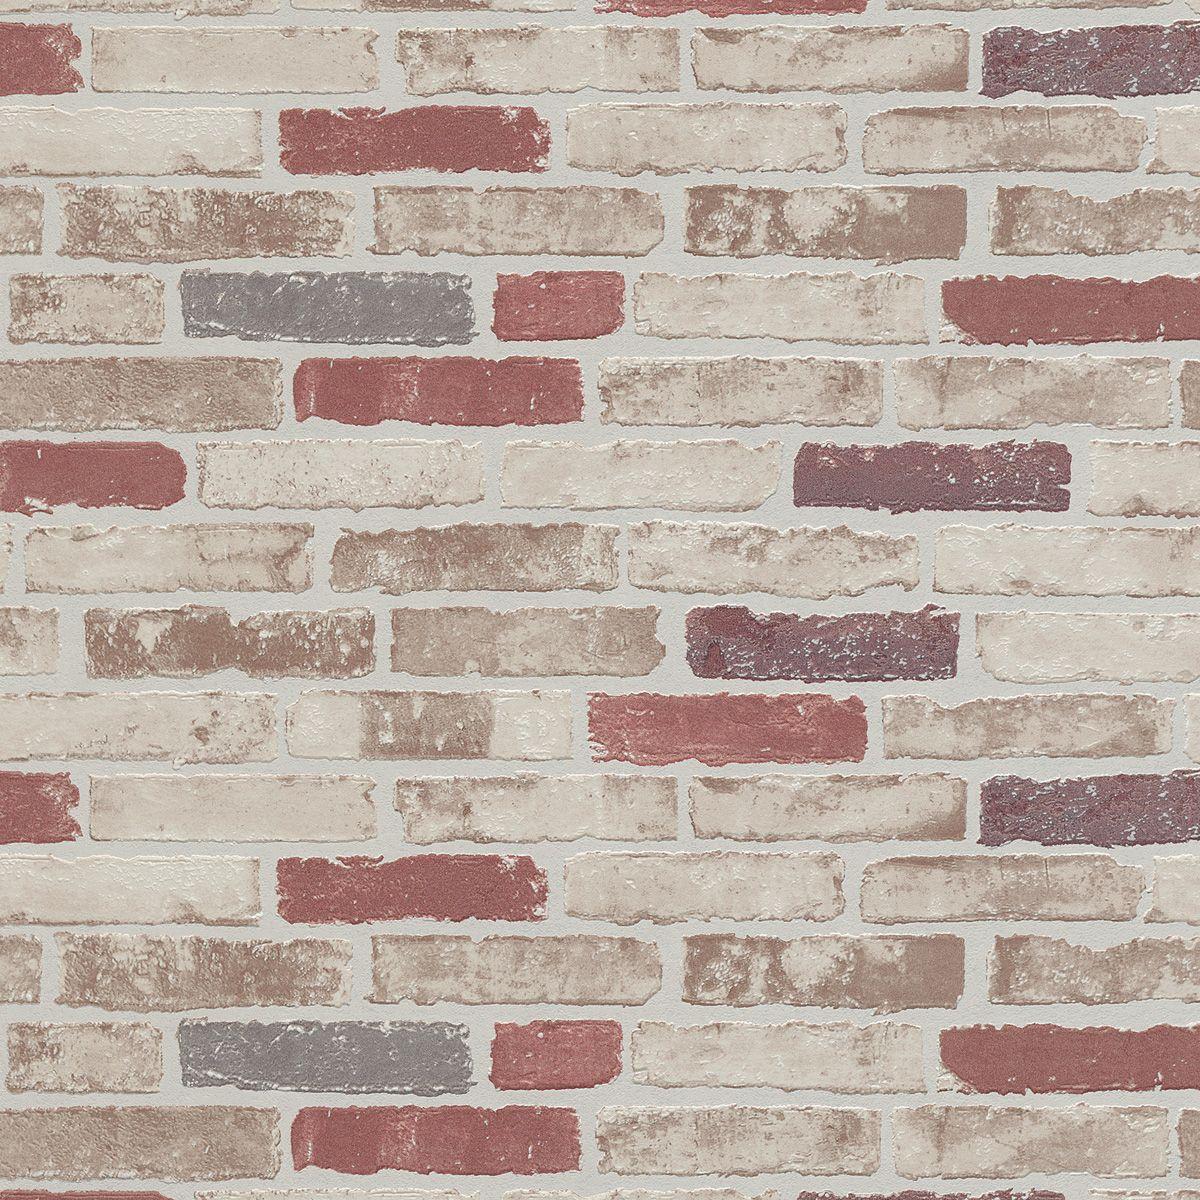 Papier peint vinyl intissé Brique bricktop marron glacé 53cmx10.05m